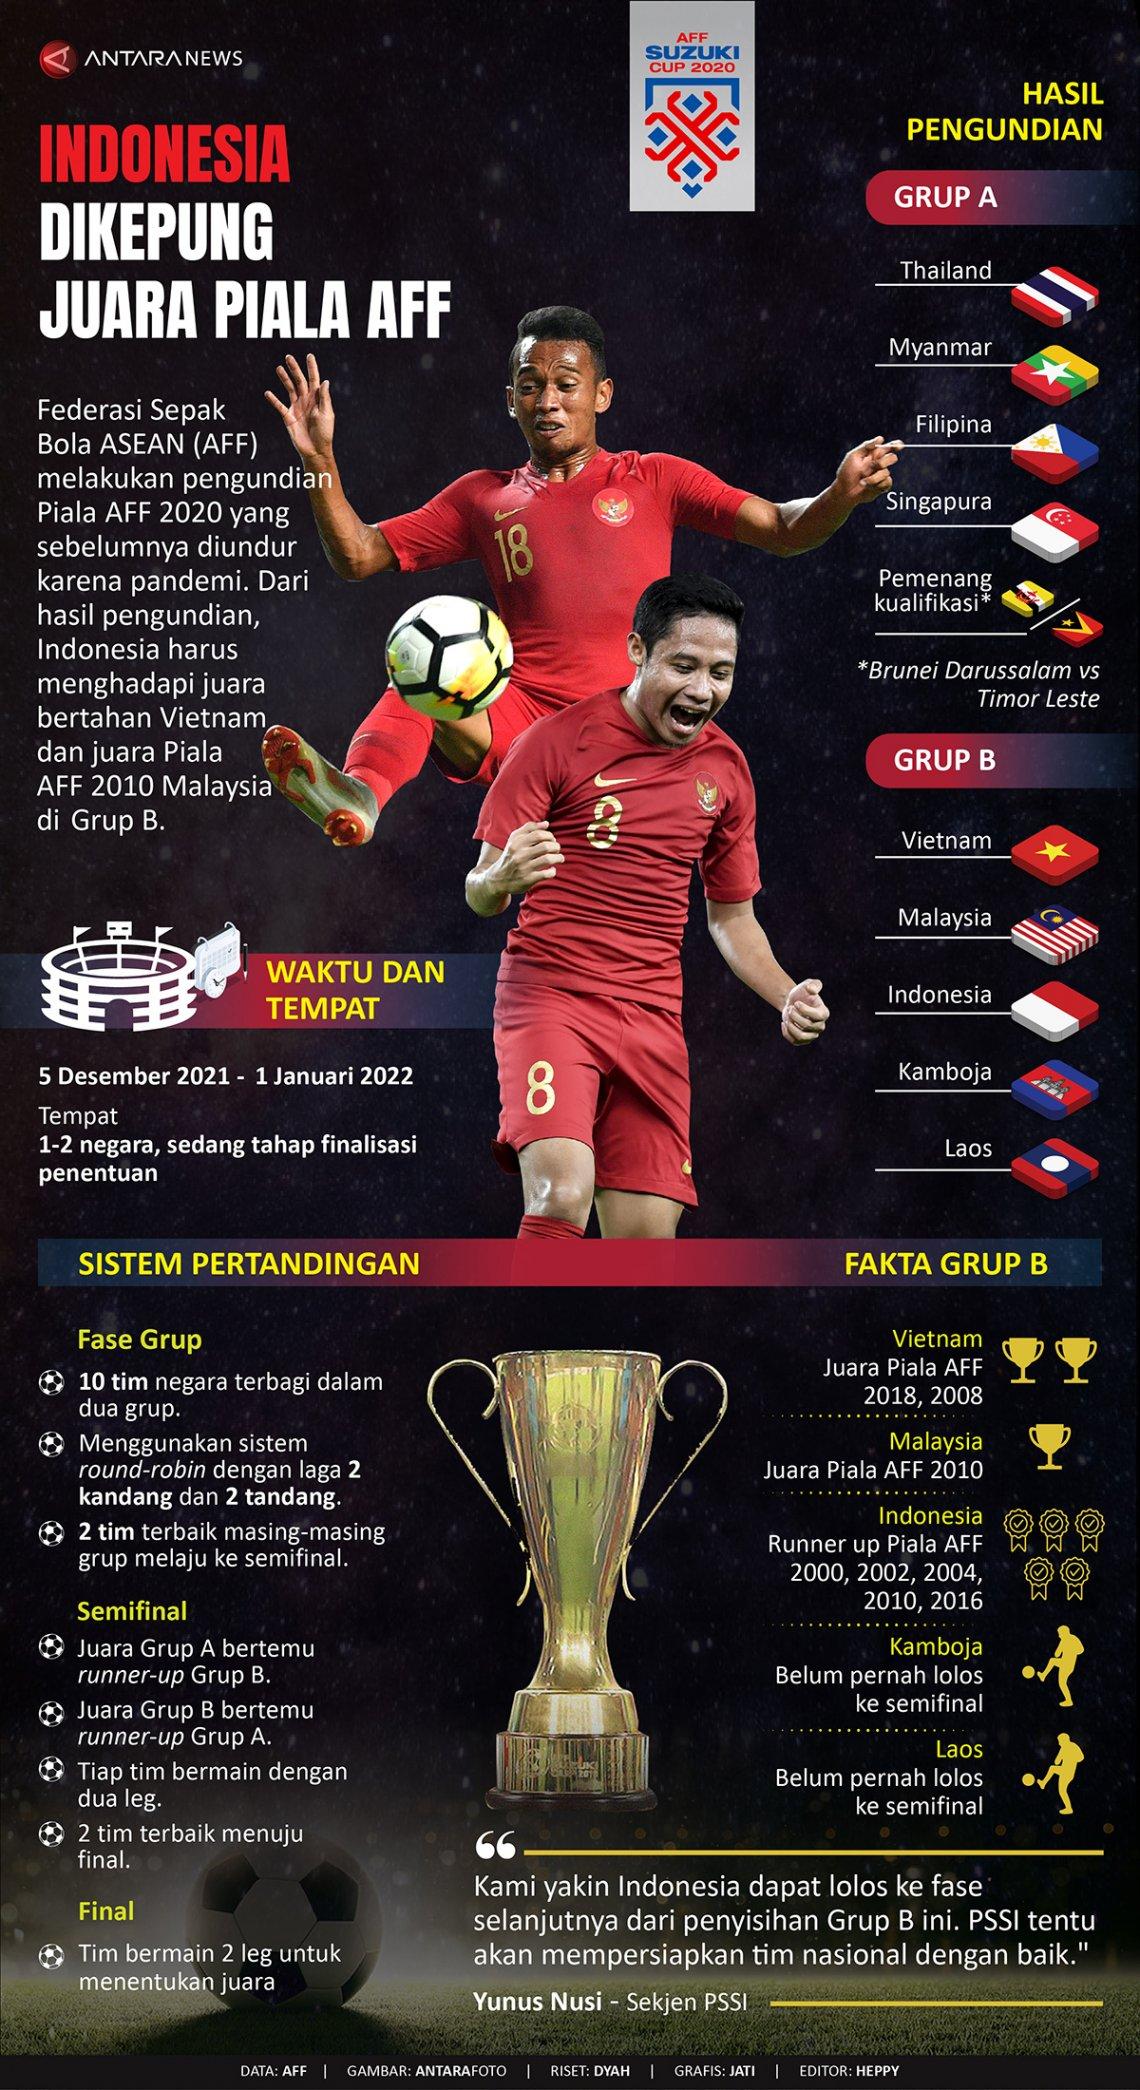 Indonesia dikepung juara Piala AFF